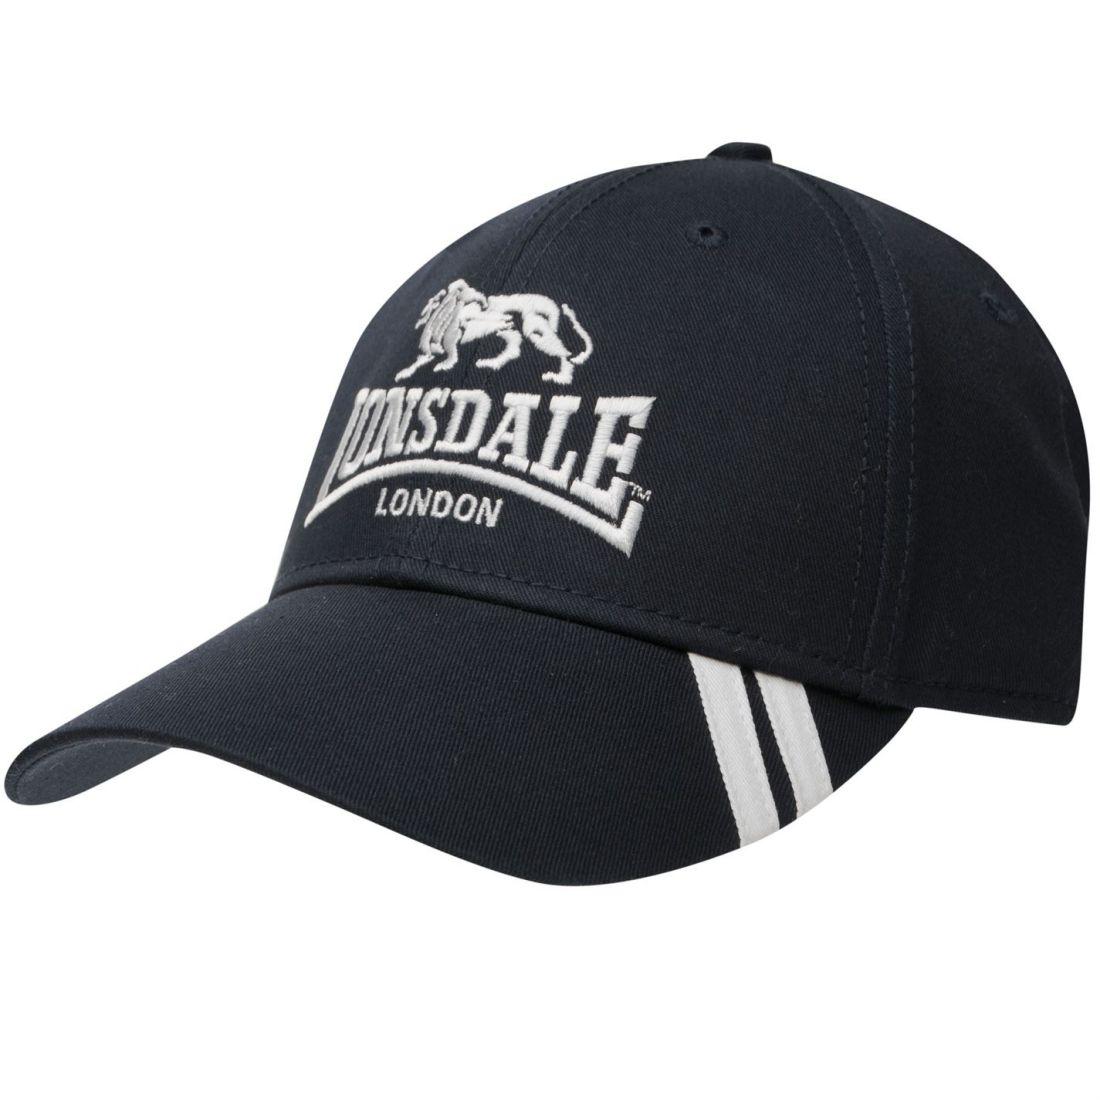 Lonsdale 2 Stripe Cap 84 Mens Gents Baseball  b42cd606eb1